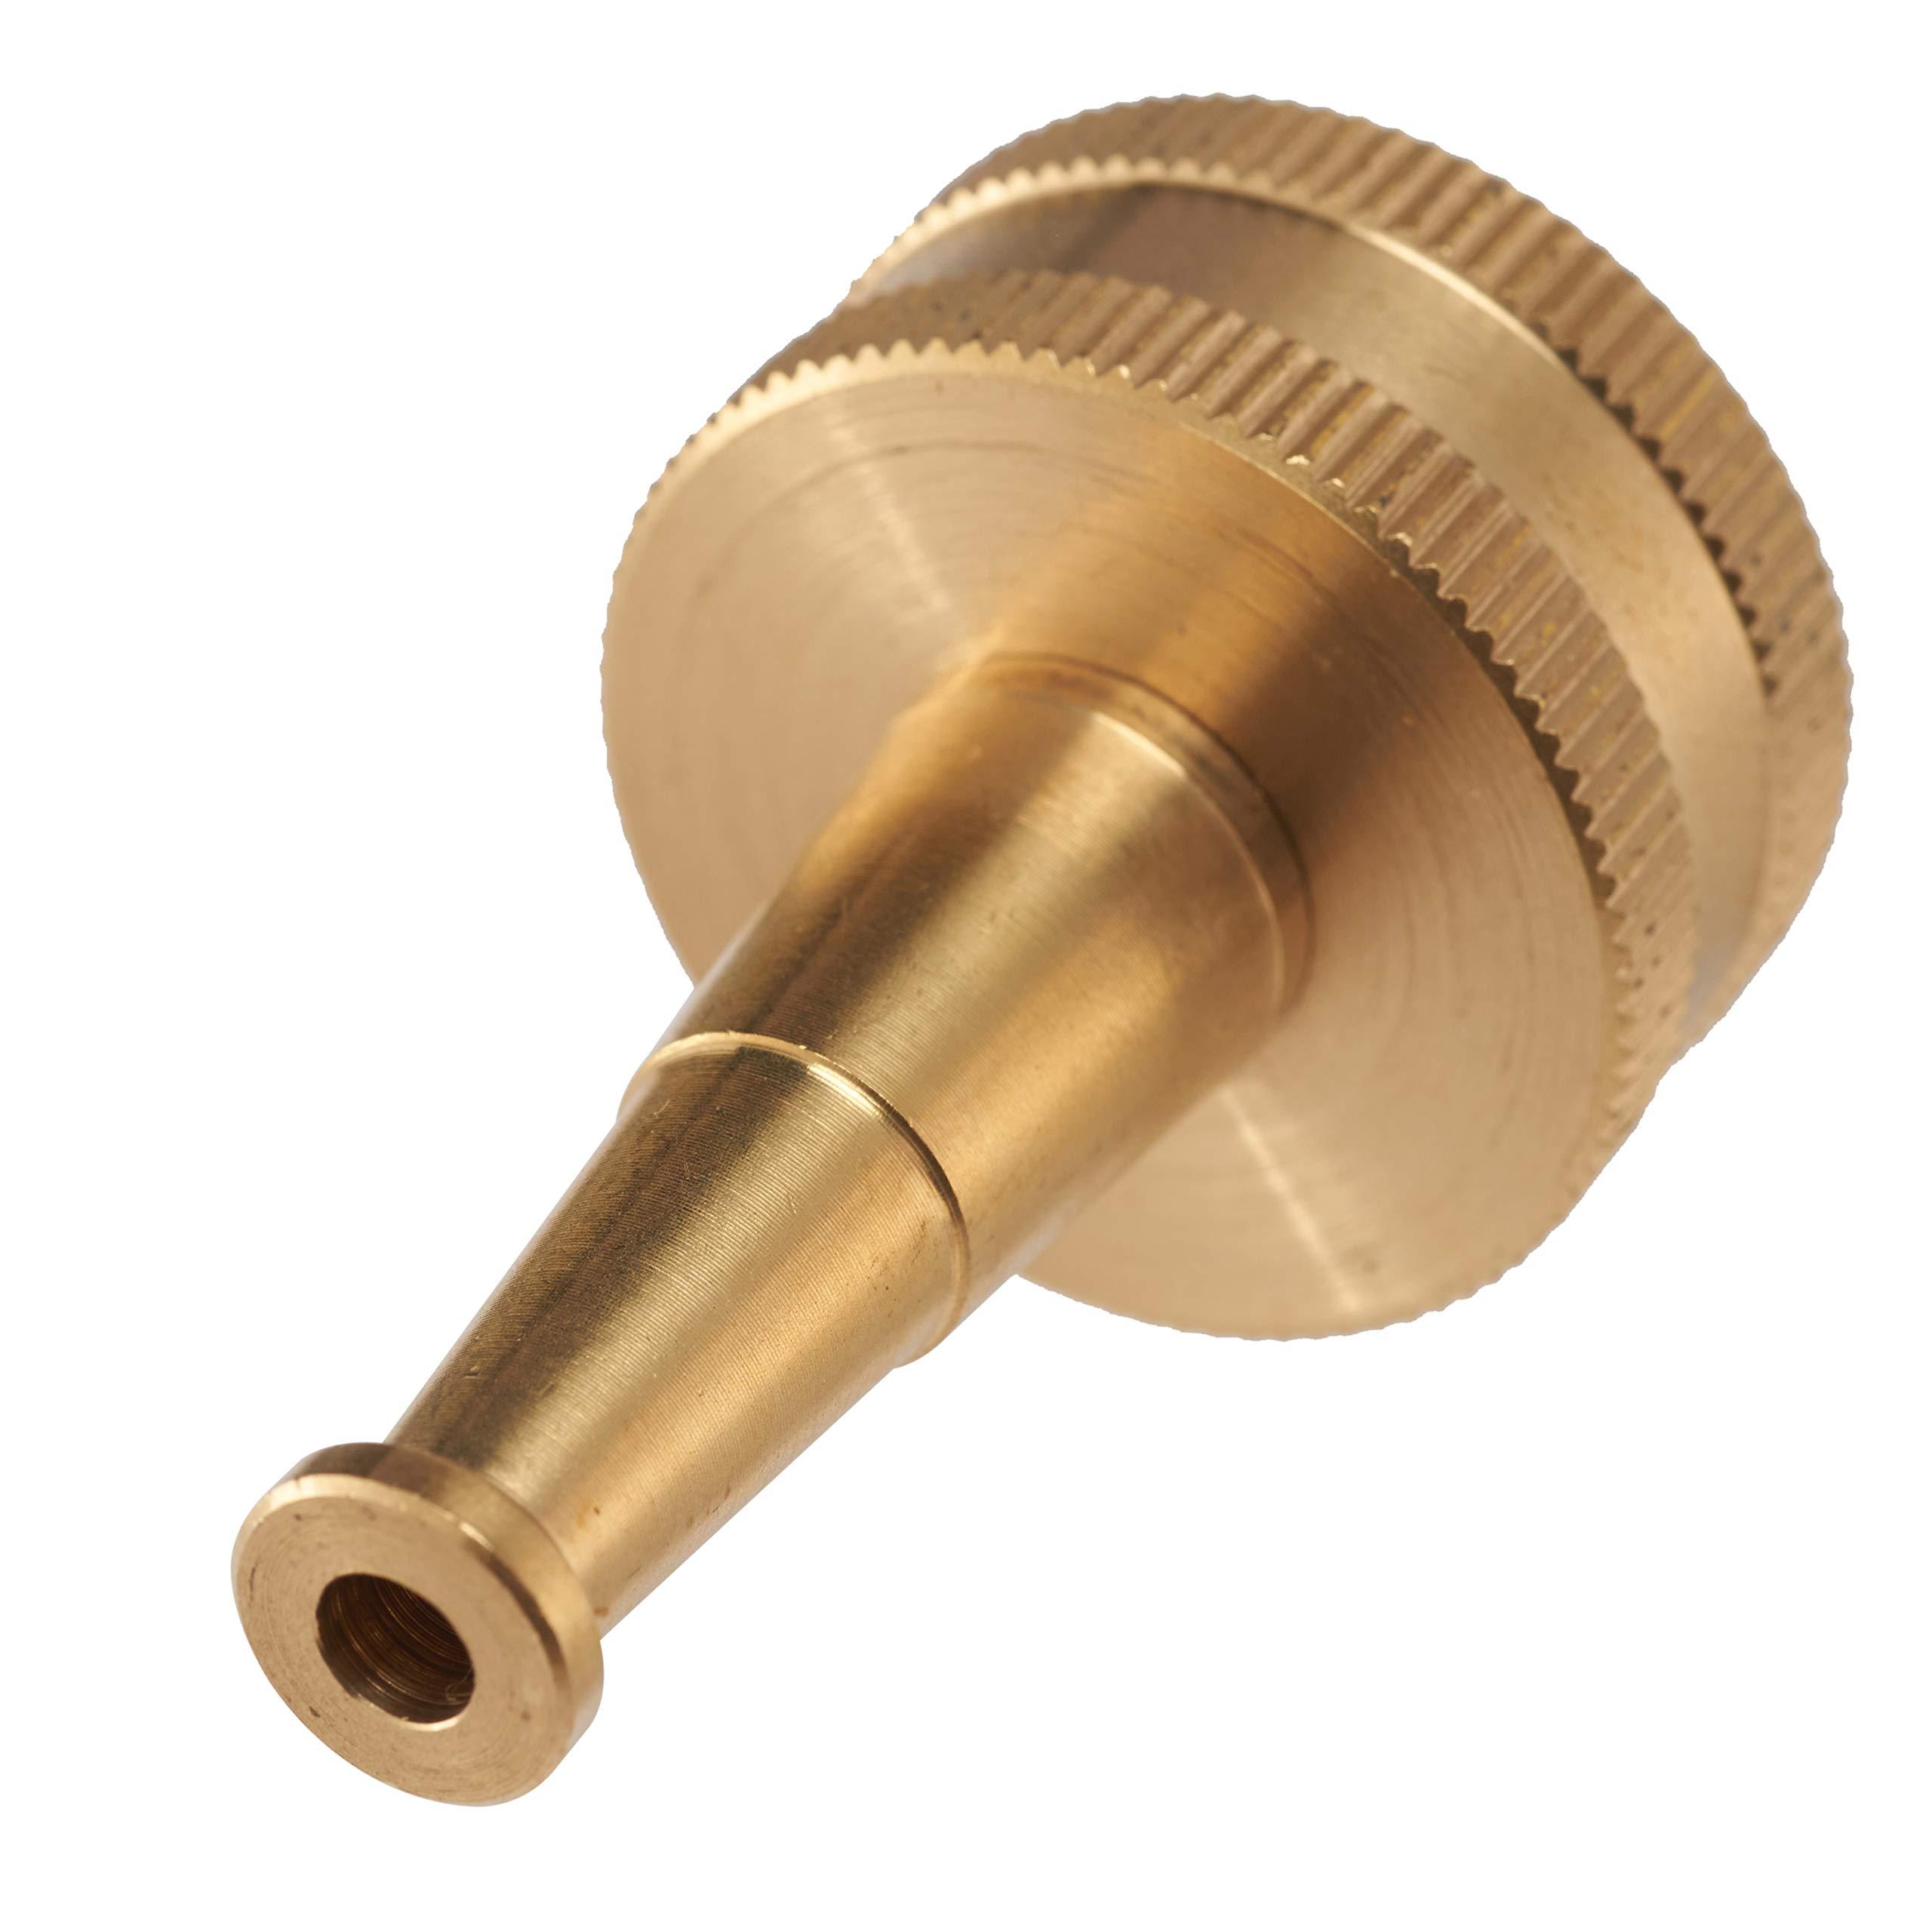 Dramm 22310 Heavy-Duty Brass Jet Wash Nozzle